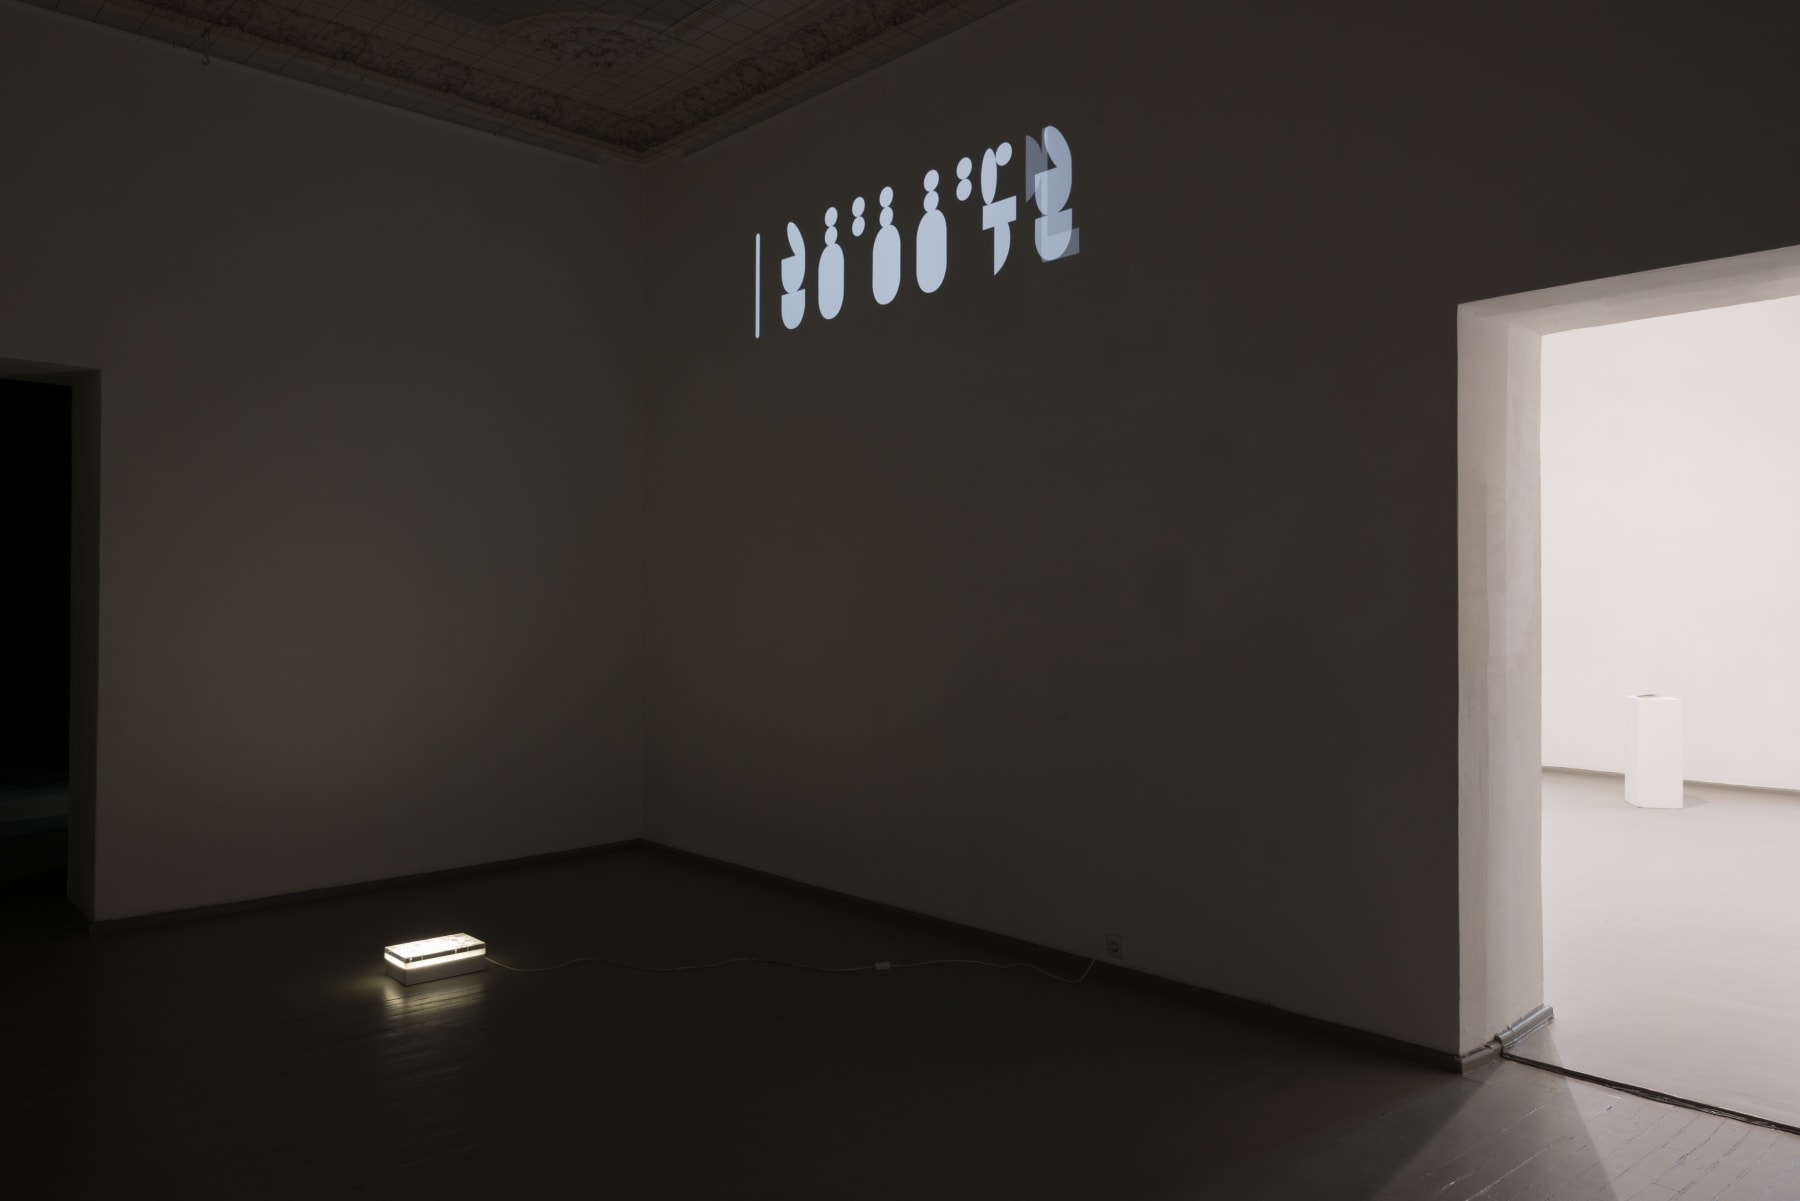 Galerija Vartai, 2016 Installation shot with Robertas Narkus's artwork from group exhibition